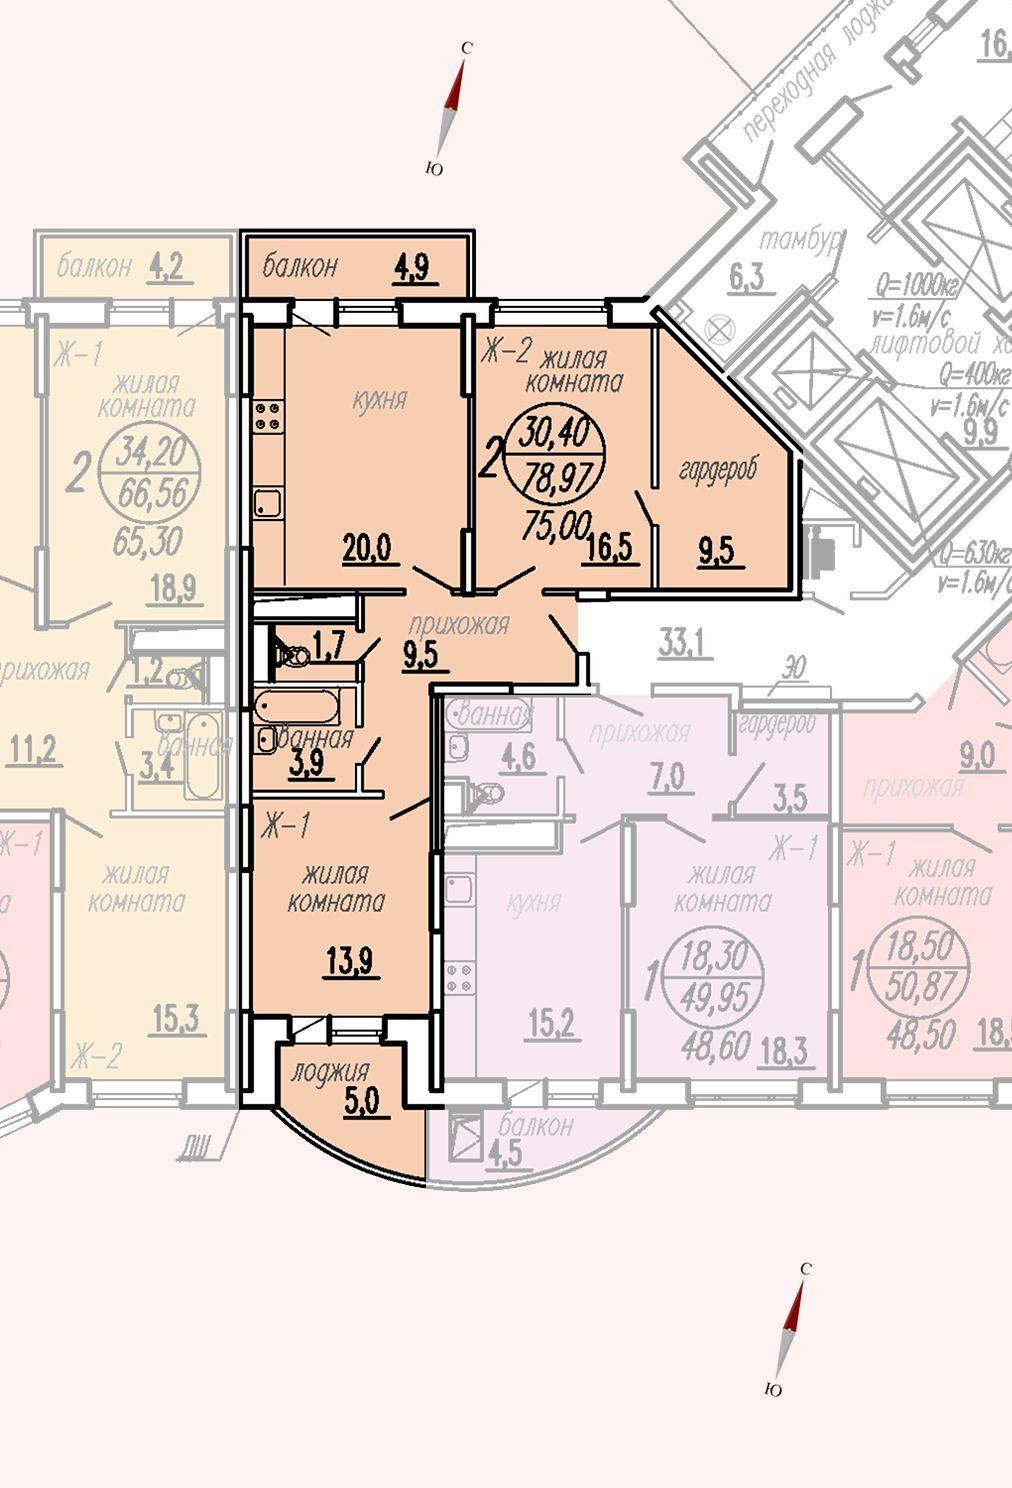 ул. Дирижабельная, д. 1, секция3, квартира 78,97 м2